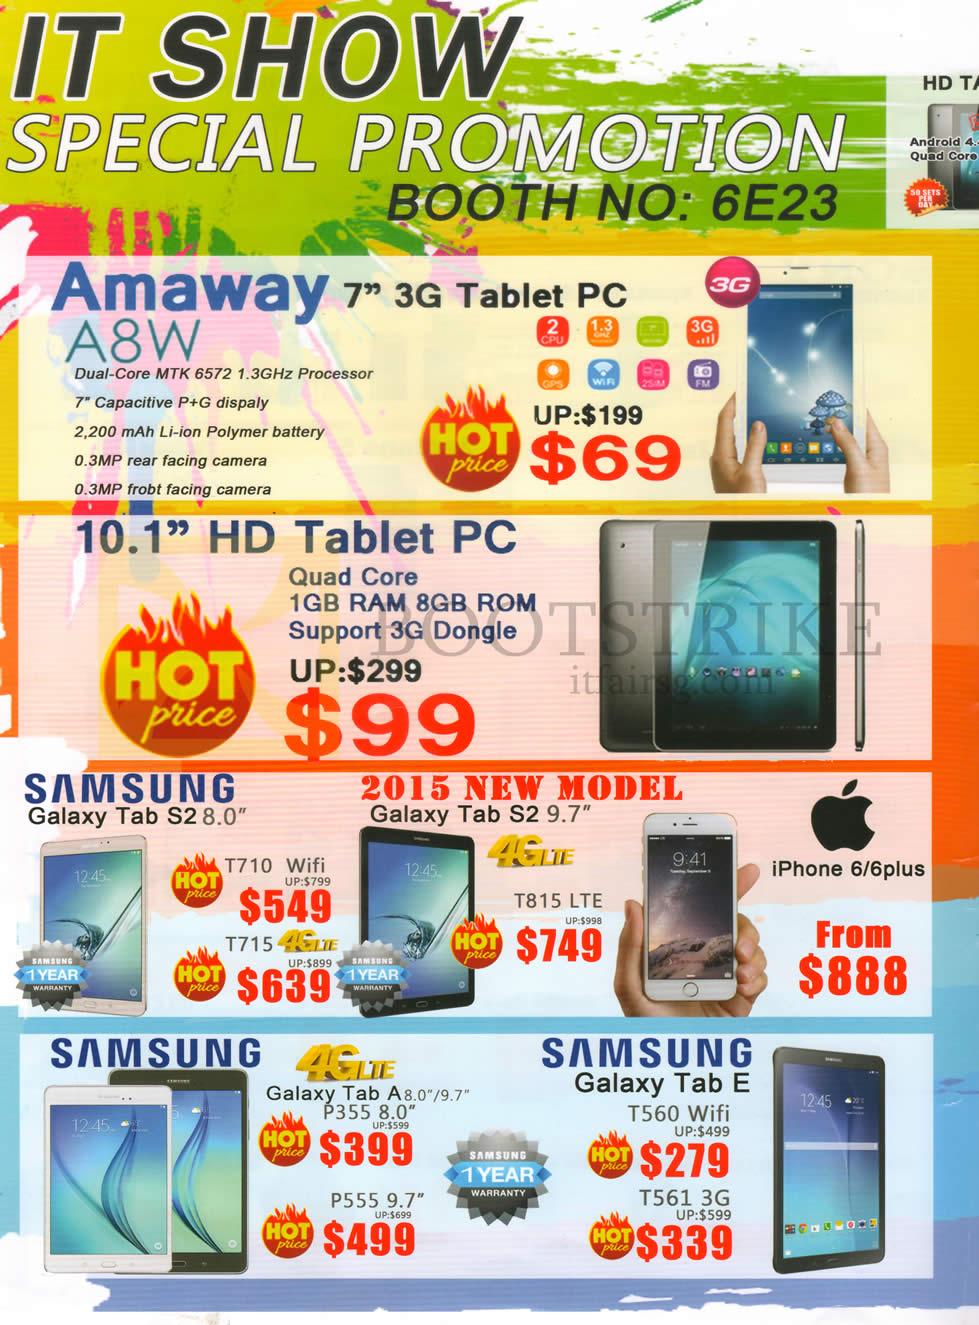 SITEX 2015 price list image brochure of CH2 Amaway 7.0, Samsung Galaxy Tab S2 8.0, S2 9.7, Galaxy Tab A 8.0, 9.7, P3555, Tab E T560 Wifi, T561